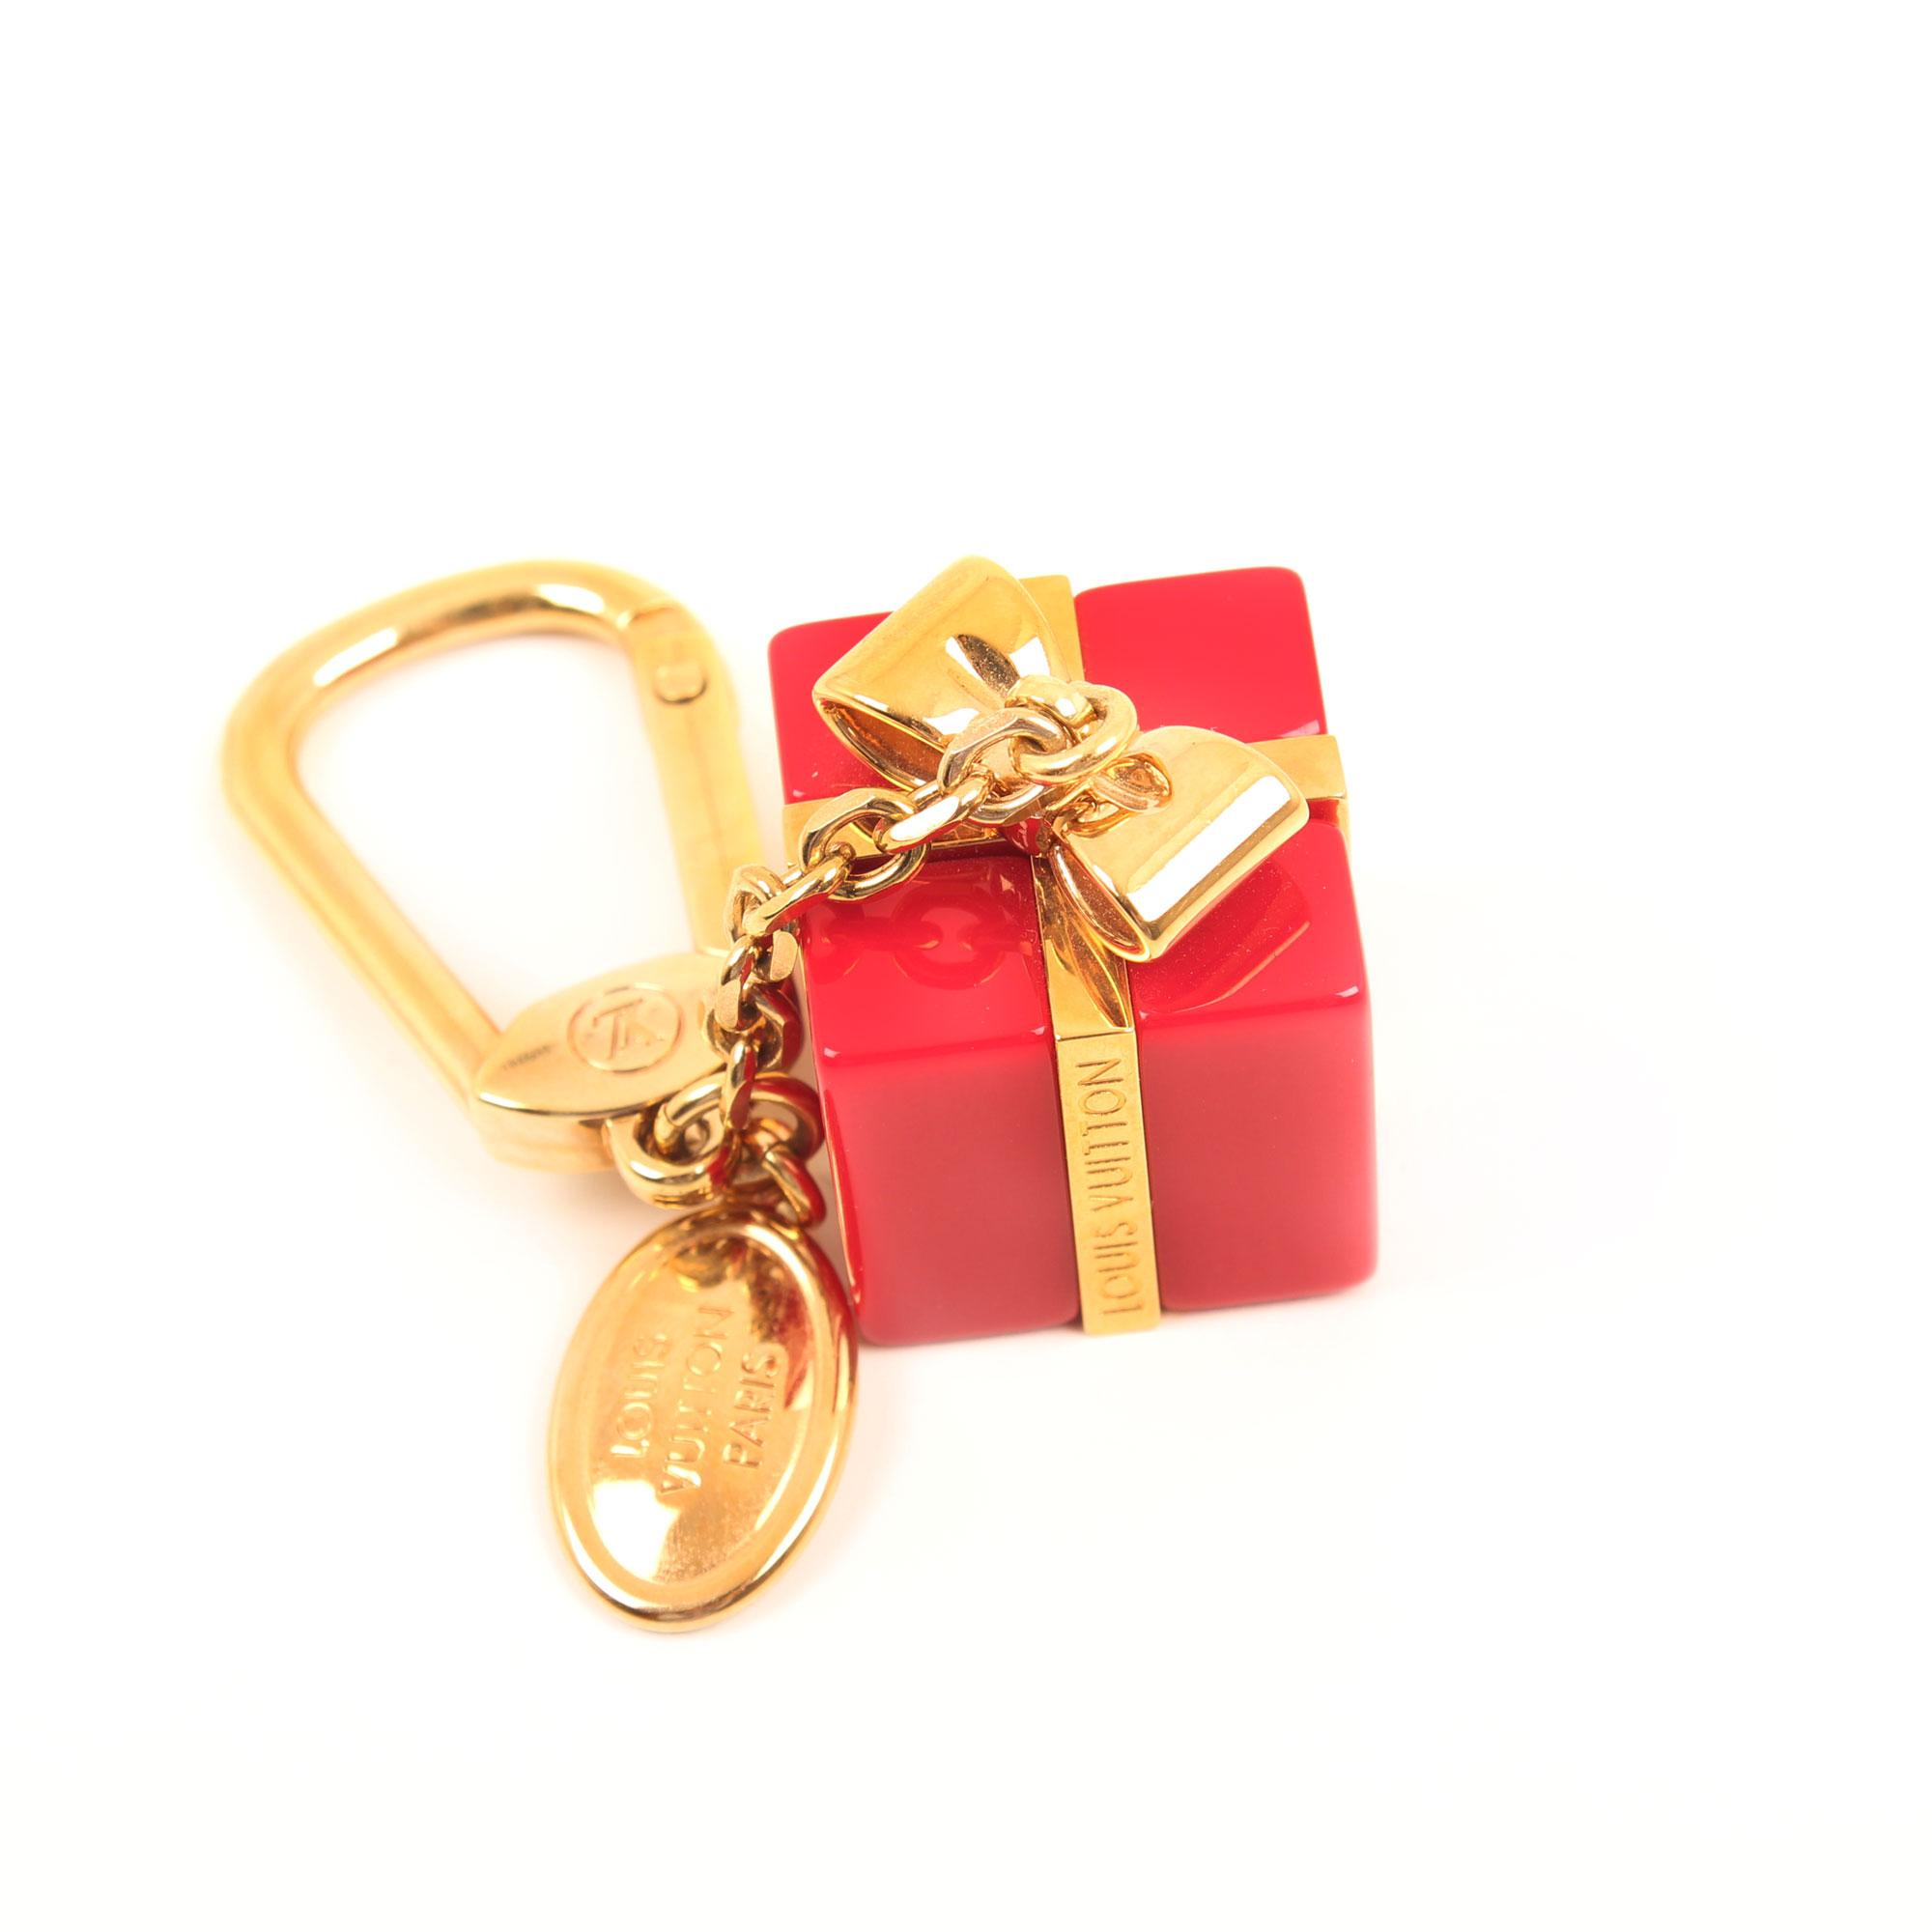 louis vuitton gift box charm bag red golden general